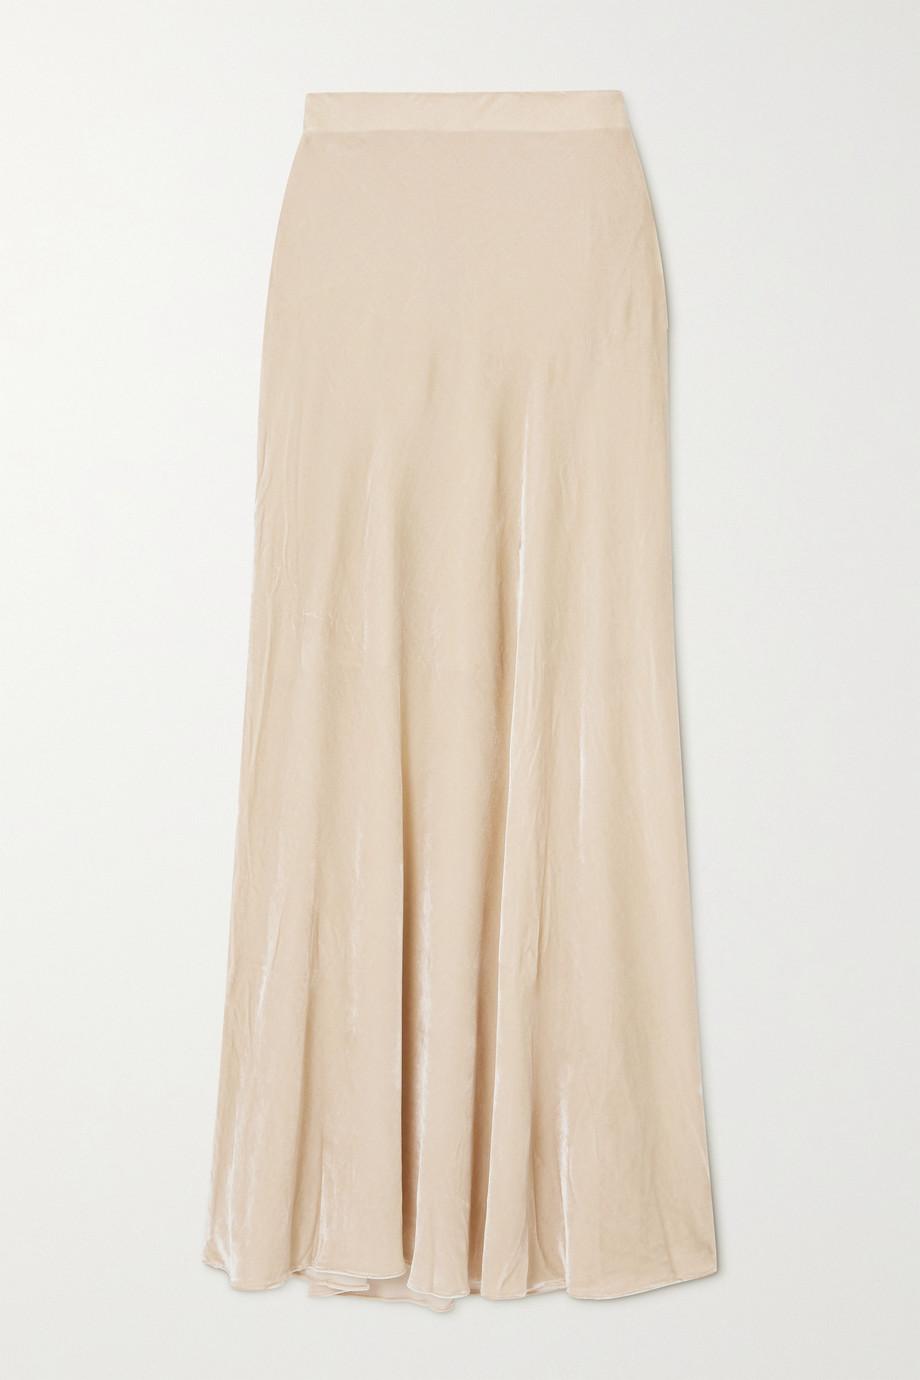 Sleeping with Jacques Bianca velvet maxi skirt